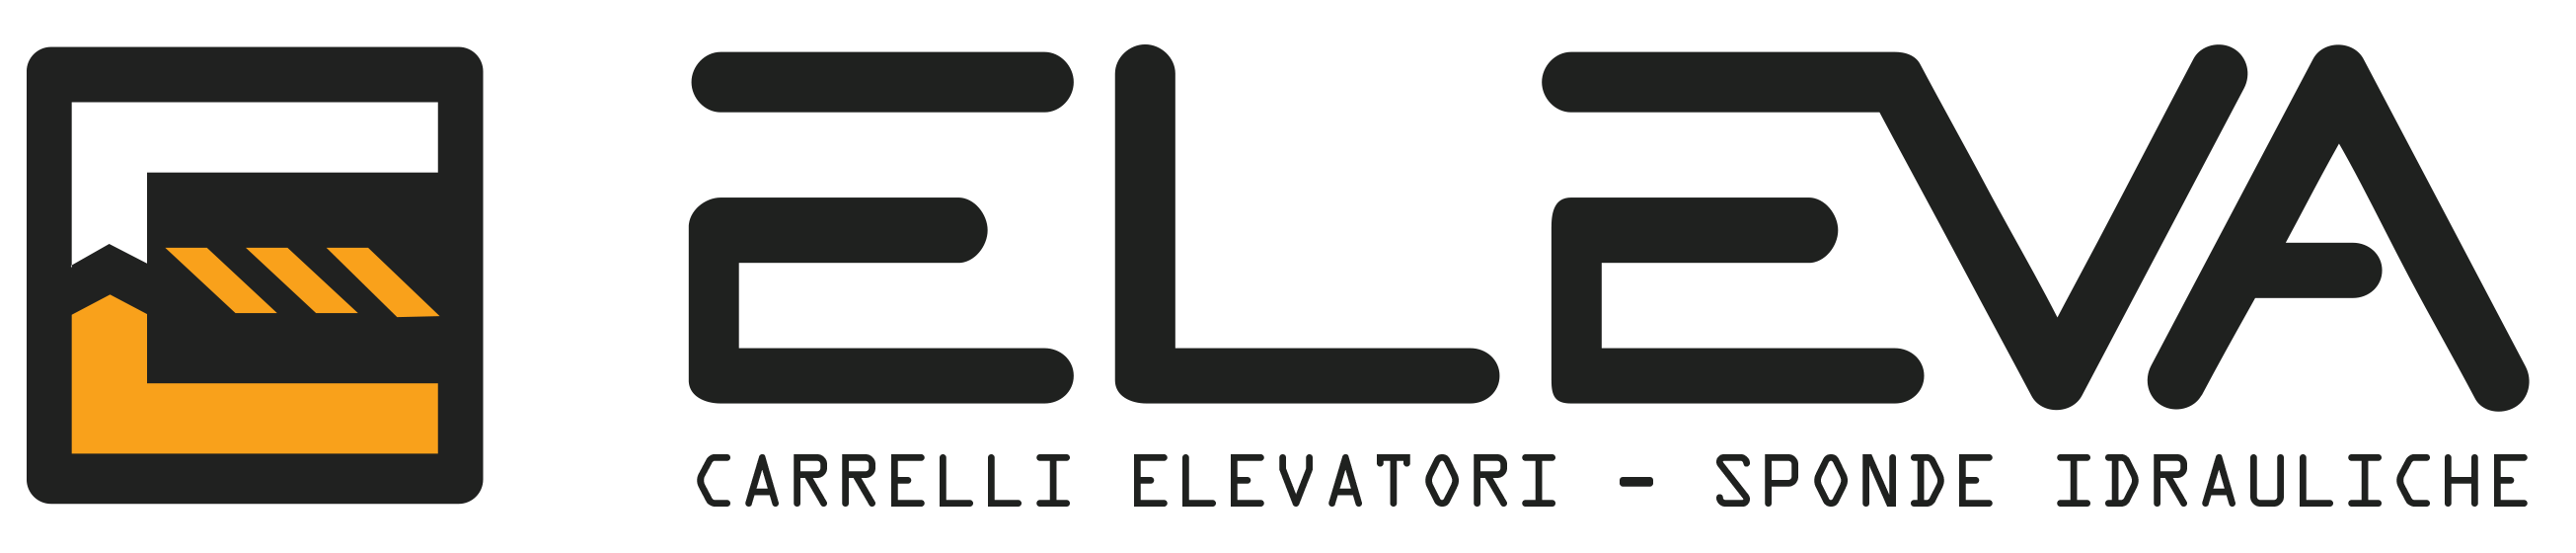 ELEVA Carrelli Elevatori - Sponde Idrauliche